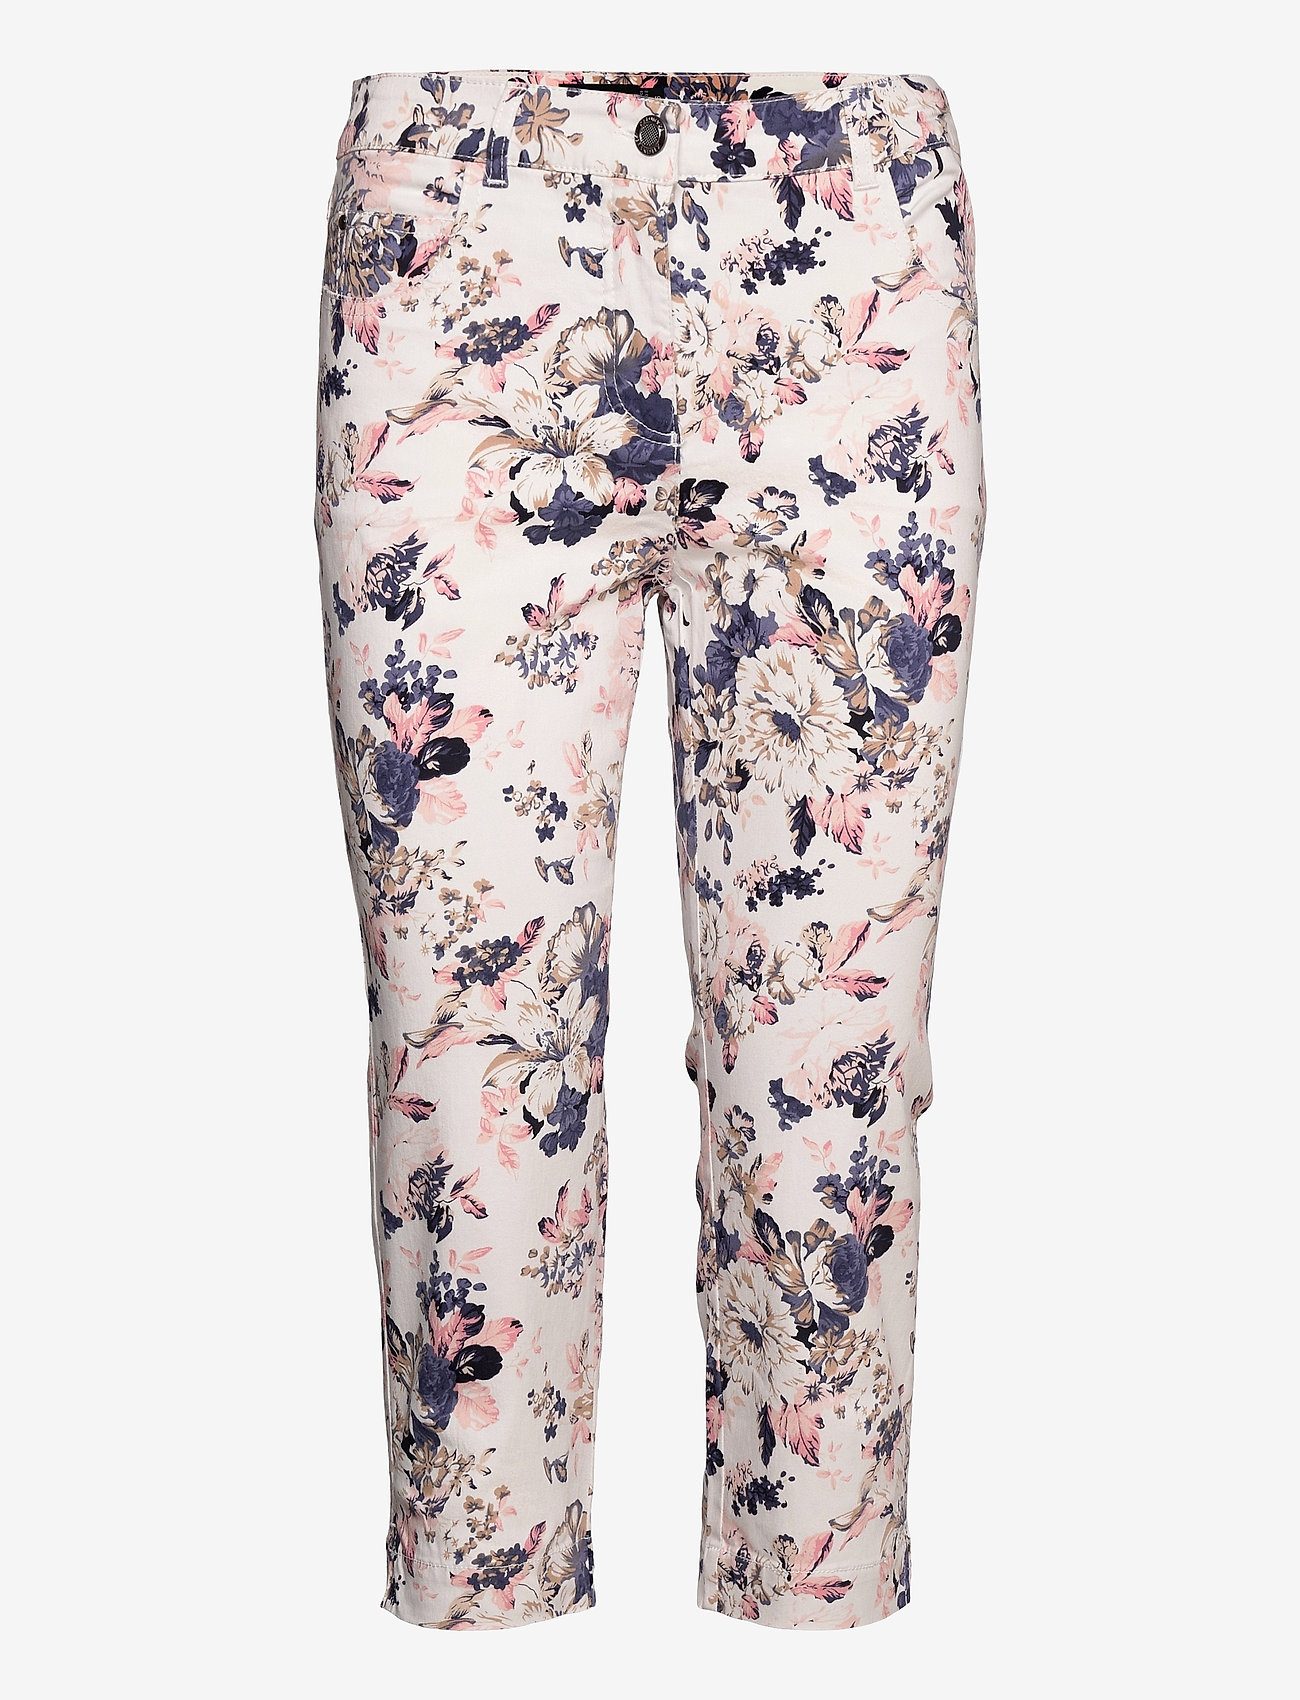 Brandtex - Capri pants - pantalons capri - pale blush - 1